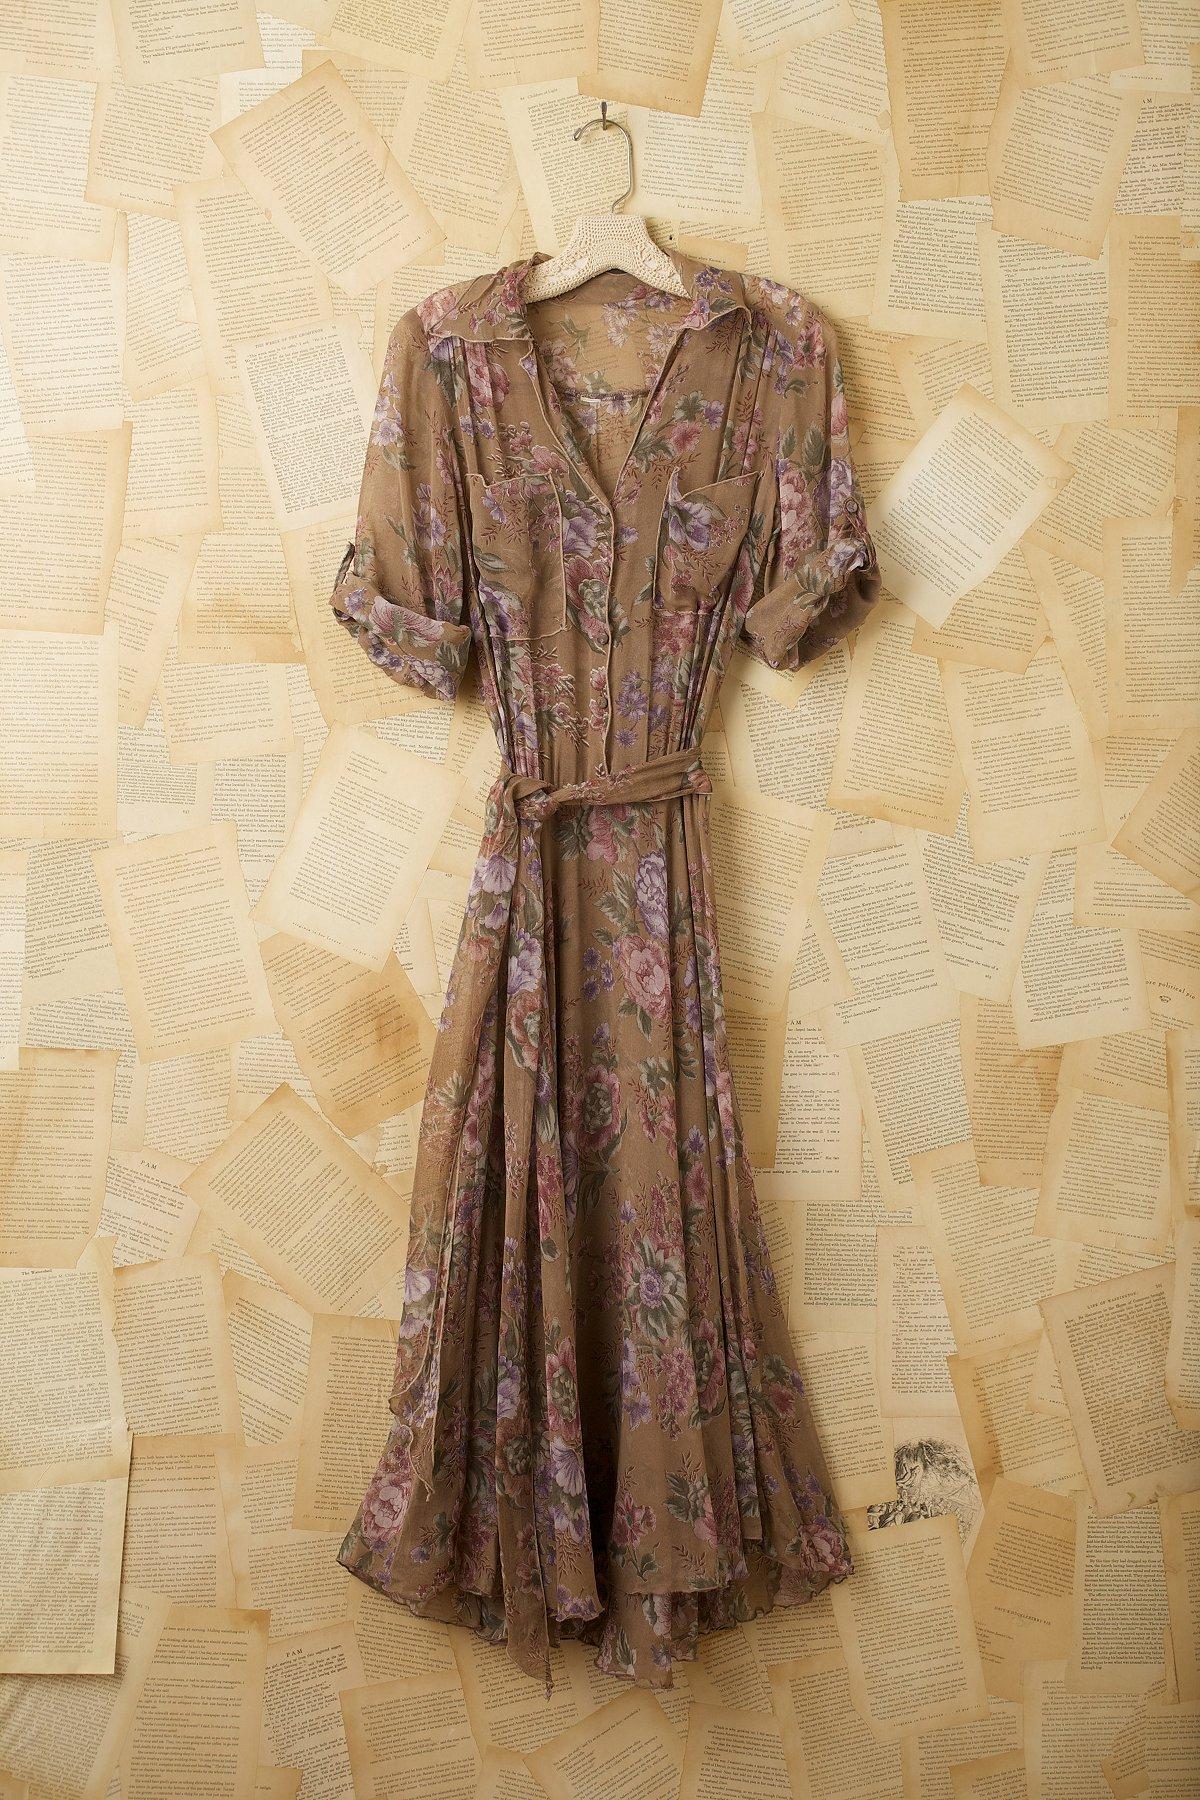 Vintage Floral Chiffon Dress